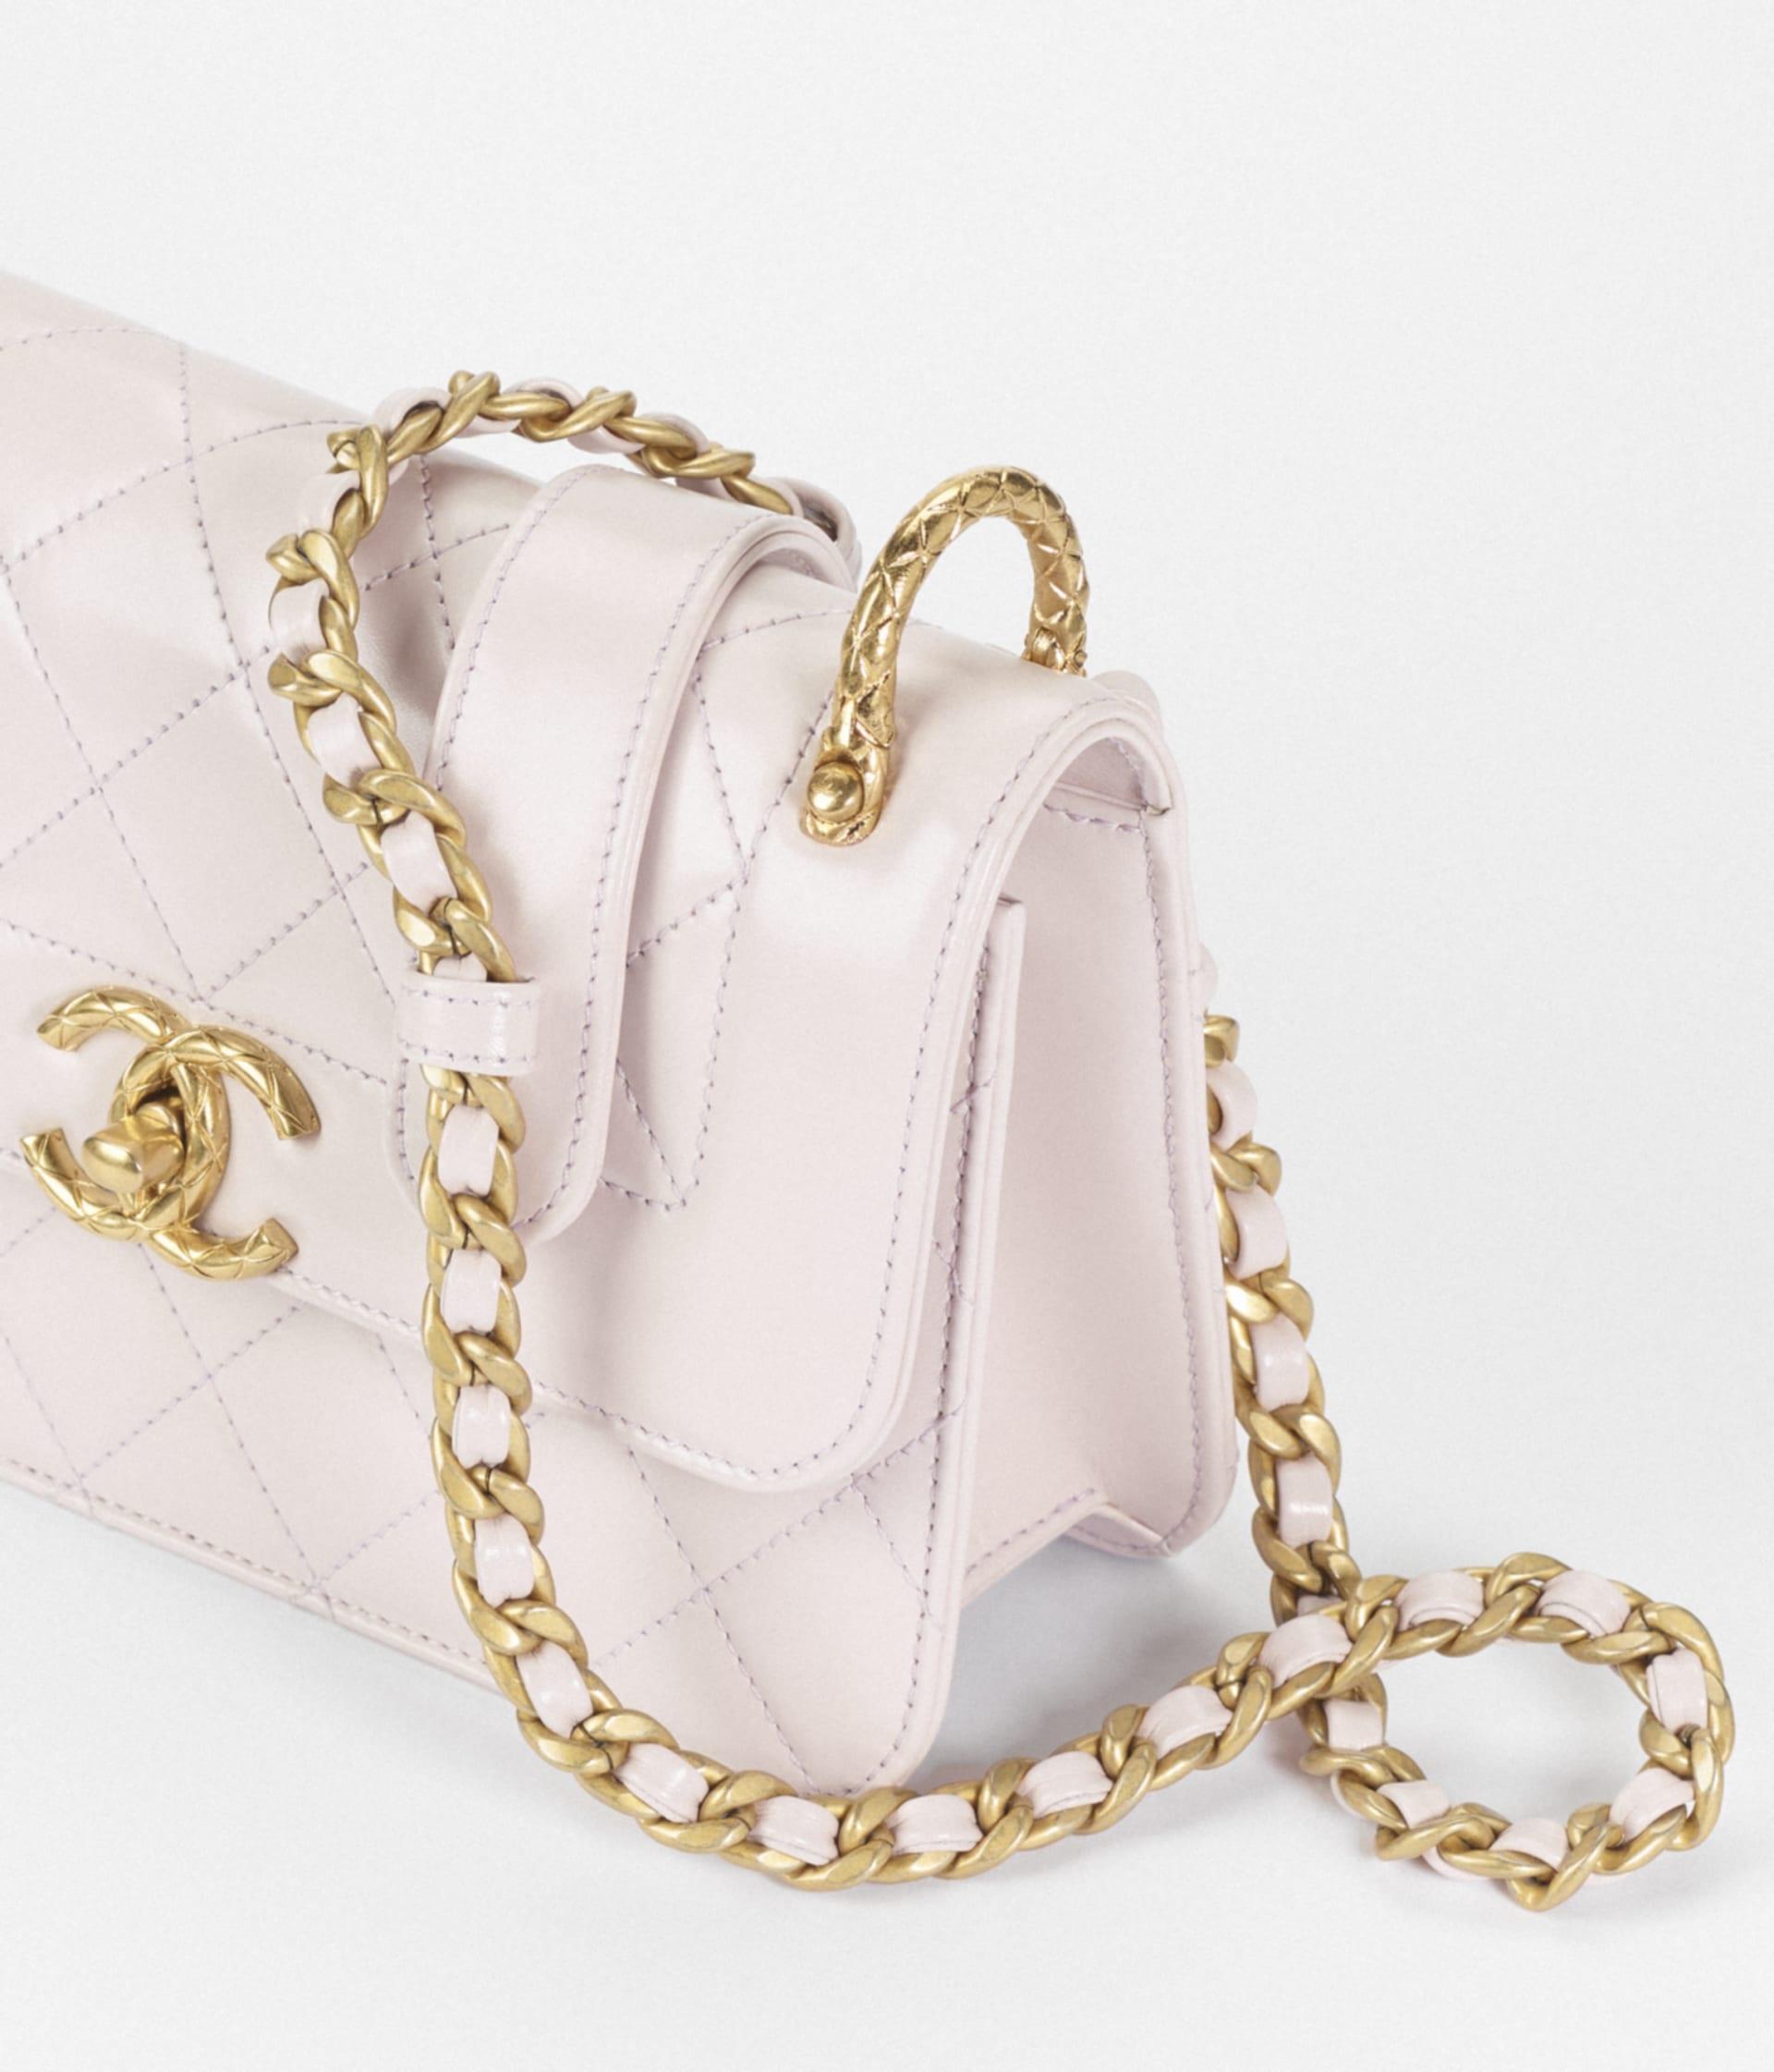 image 3 - Mini Flap Bag - Calfskin & Gold-Tone Metal - Light Purple